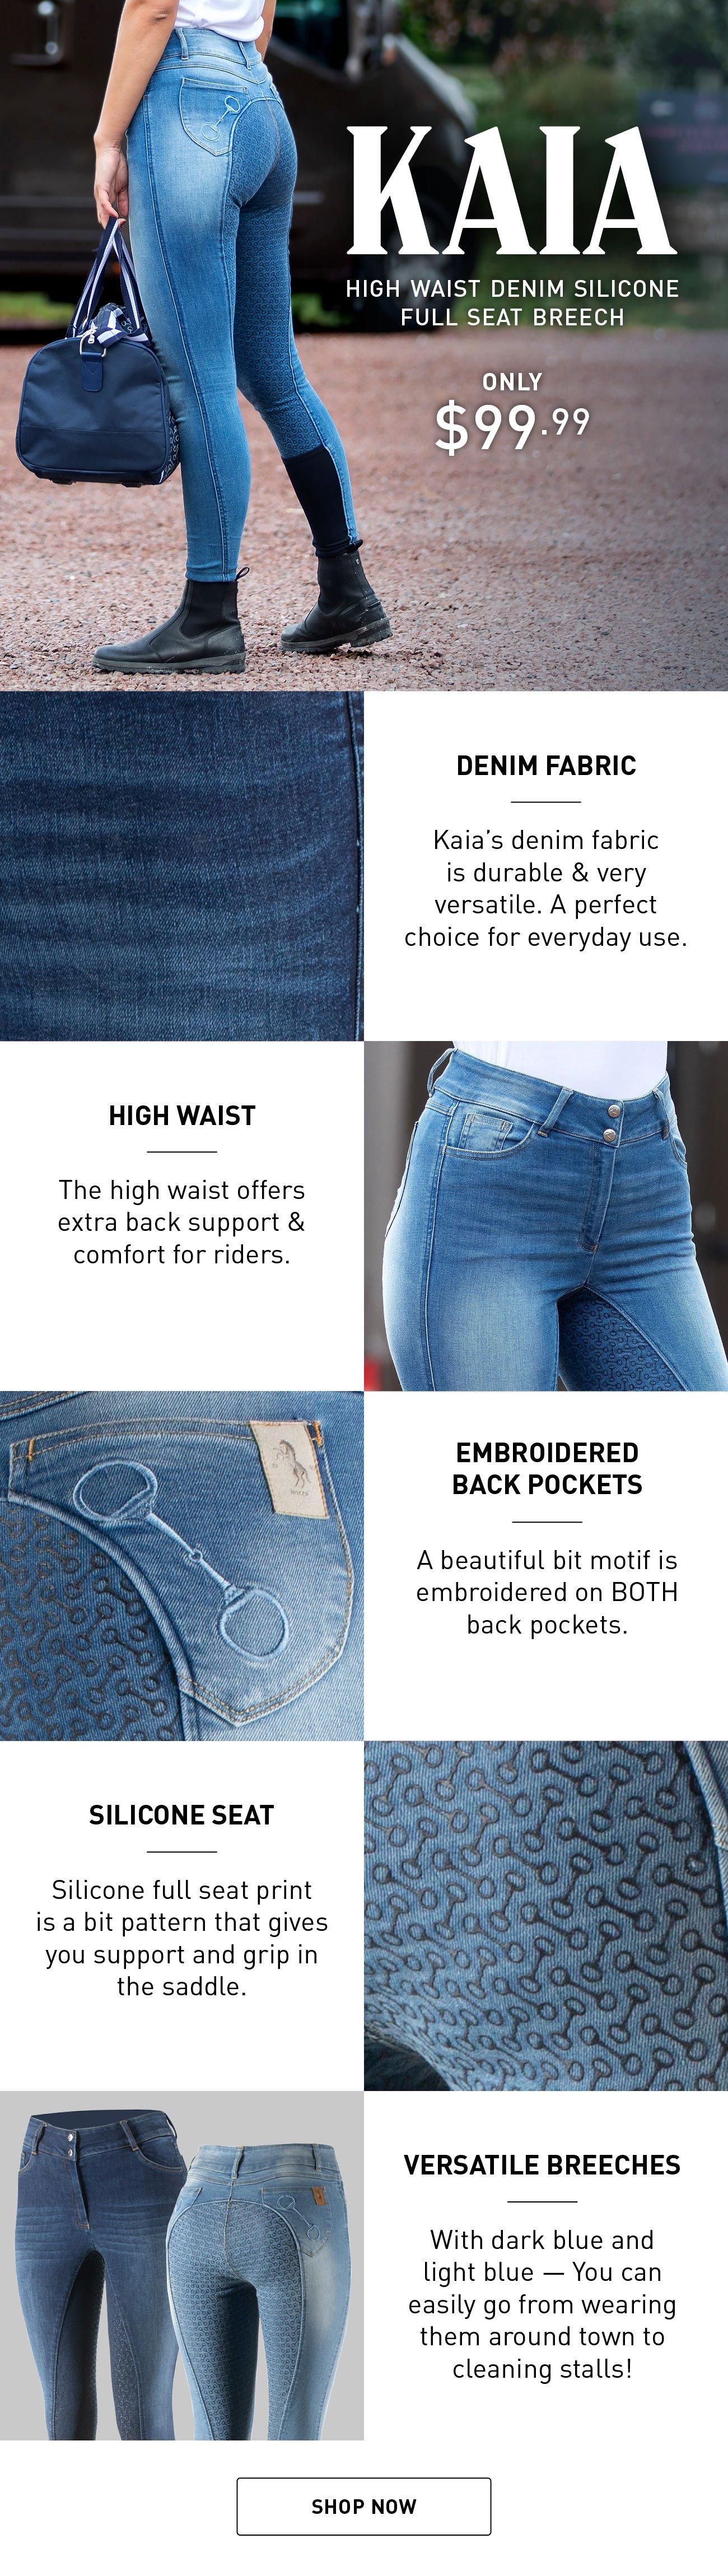 Horze Womens Limited Edition Kacy Full Seat Breeches Denim